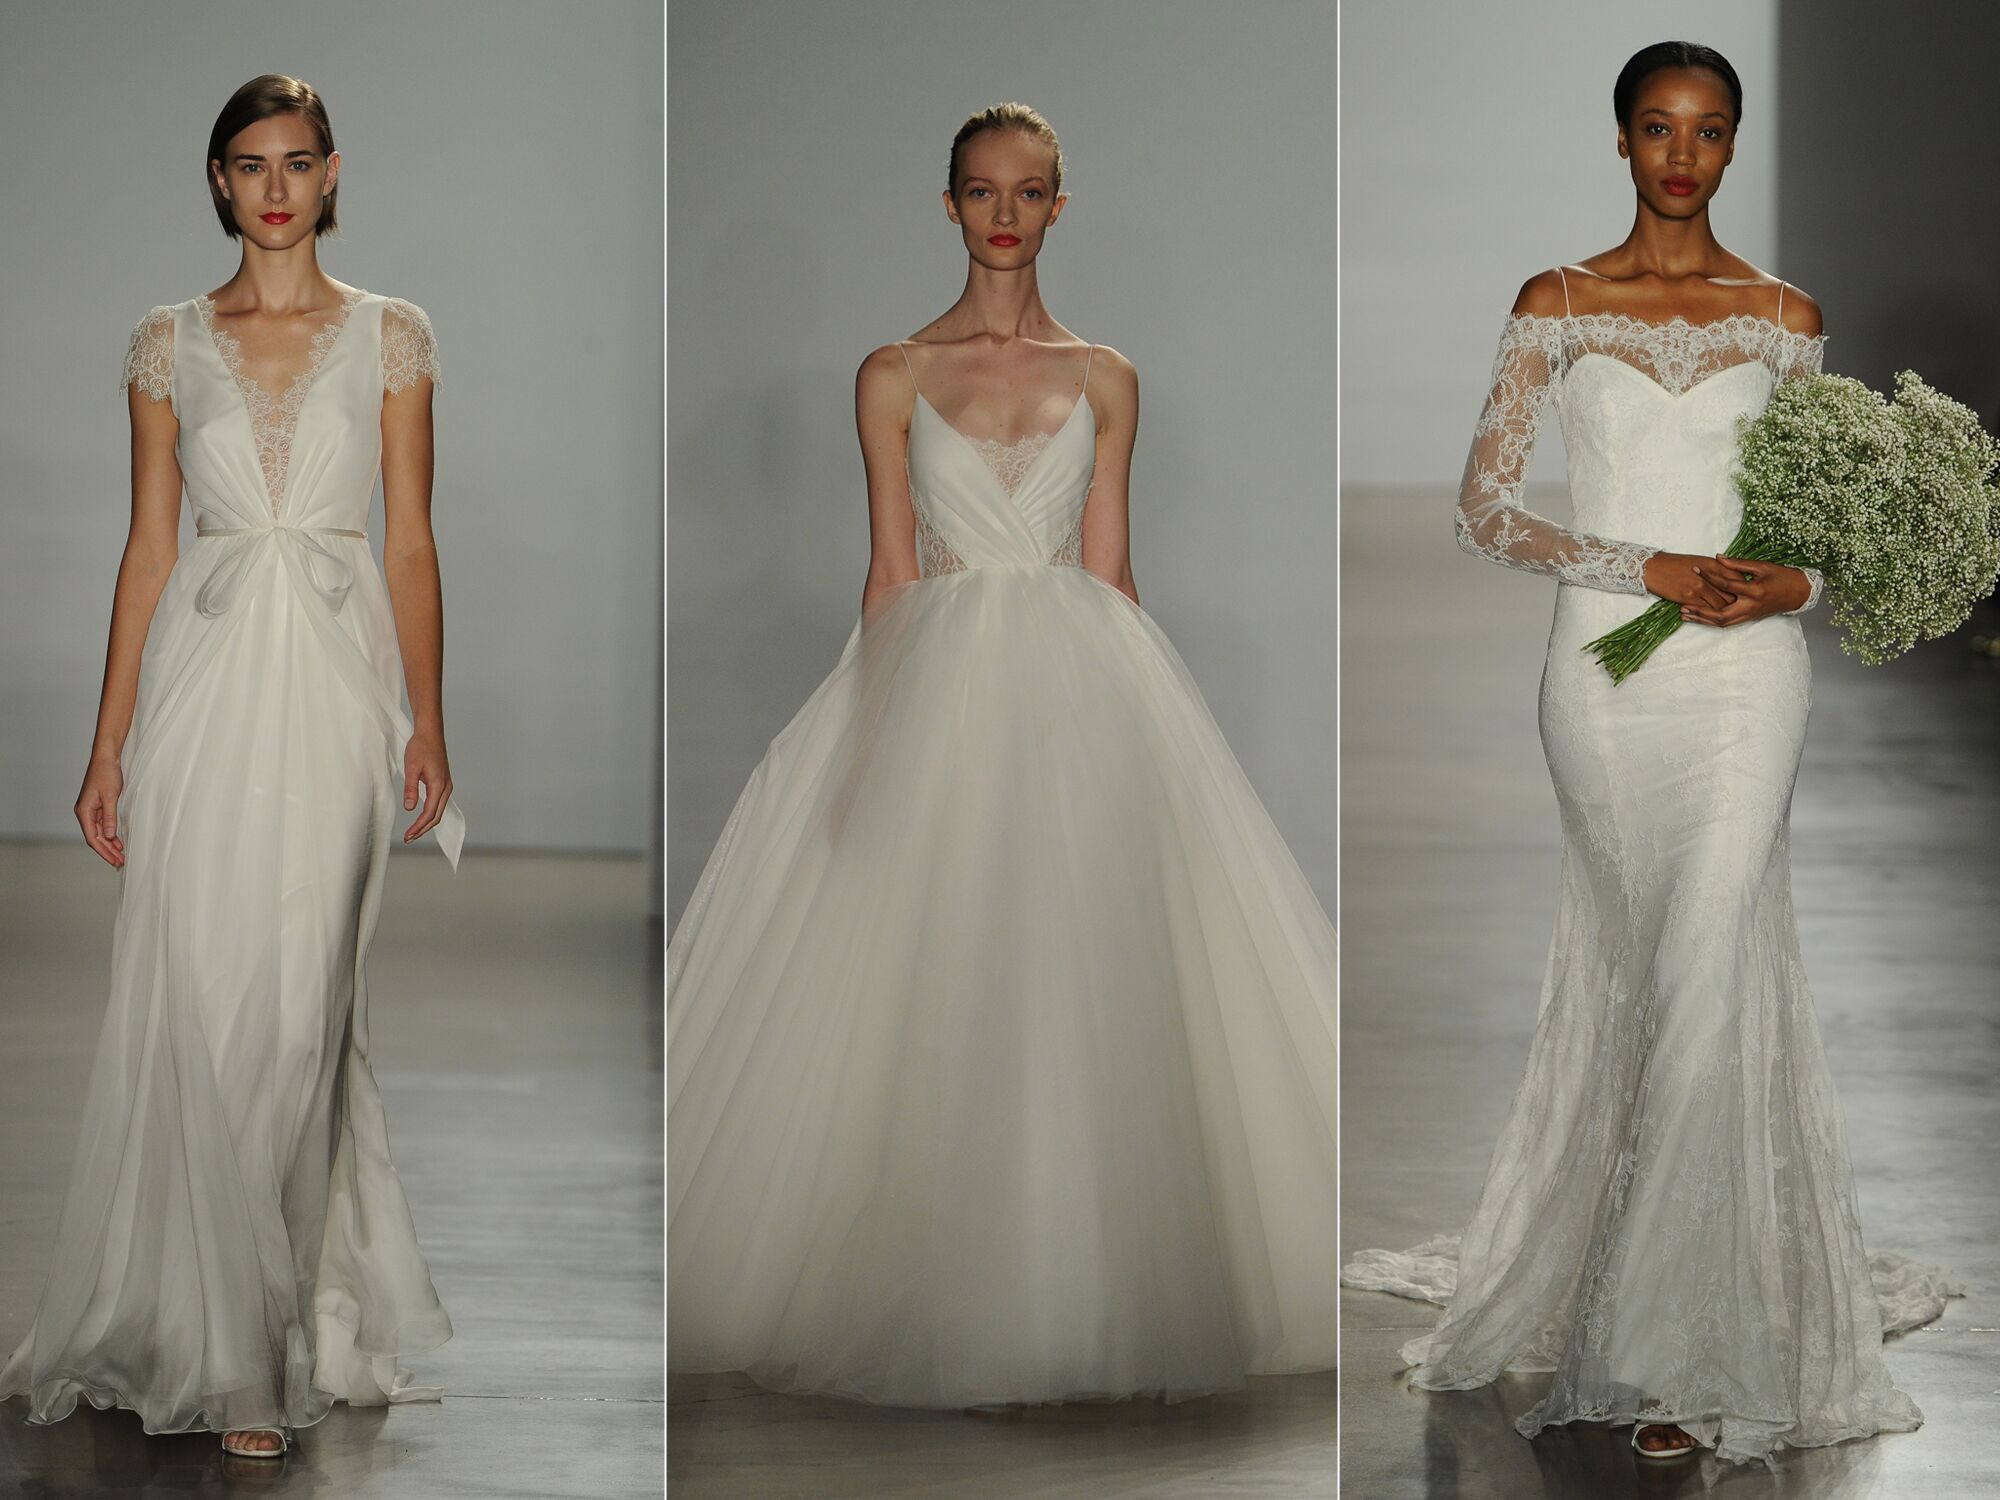 Wedding Gowns 2016: Christos Fall 2016 Collection: Wedding Dress Photos